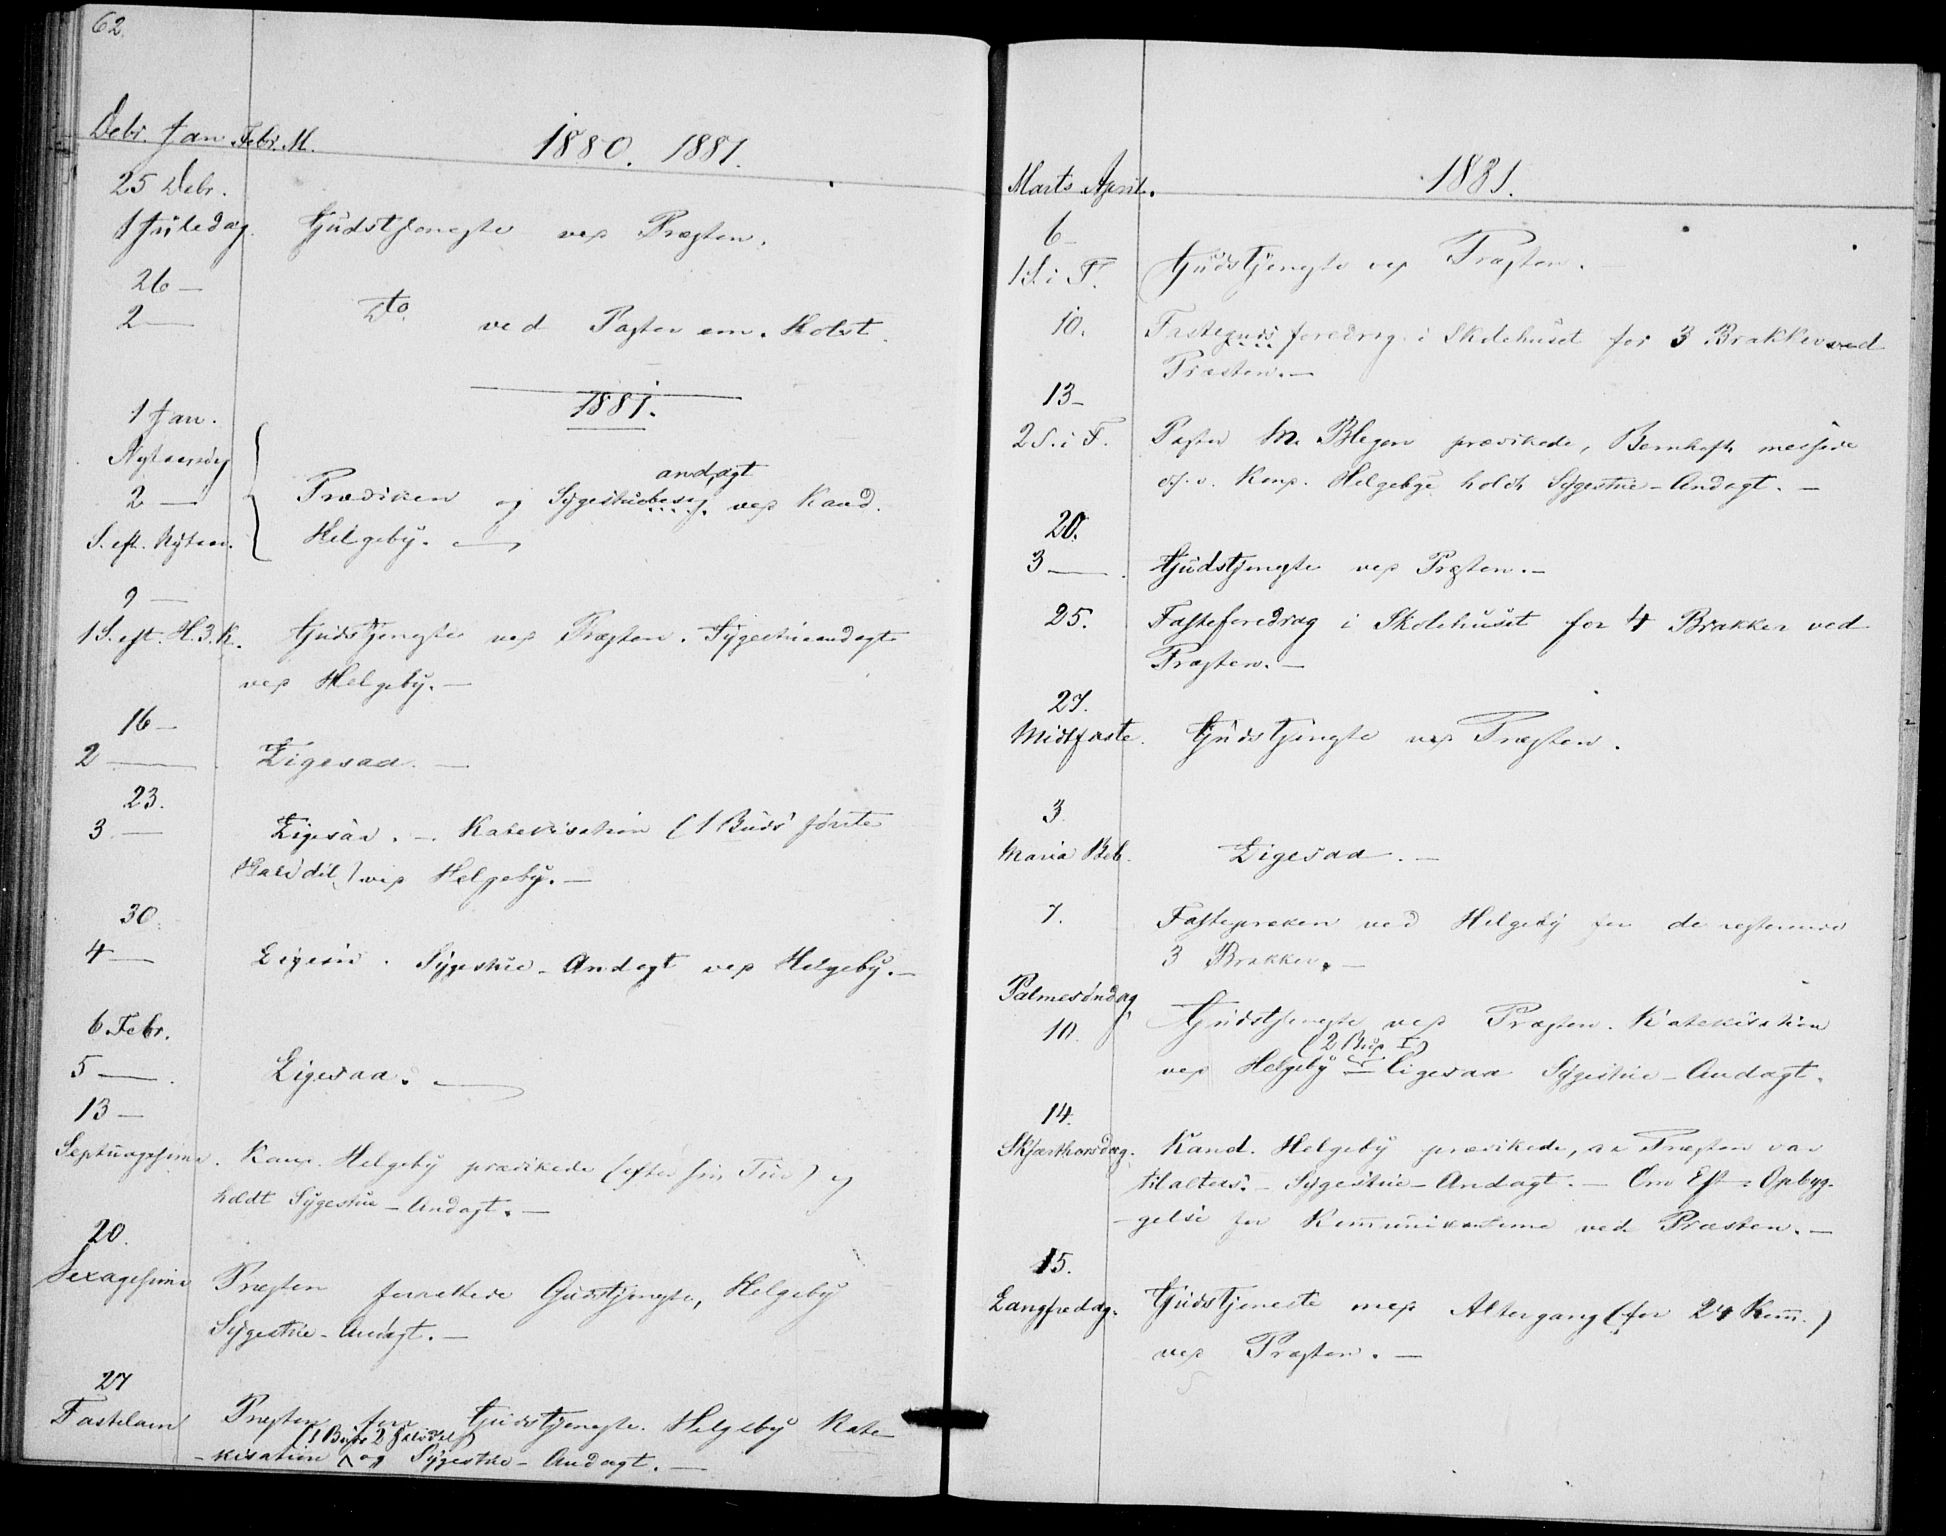 SAO, Akershus festnings slaveri Kirkebøker, F/Fa/L0002: Ministerialbok nr. 2, 1852-1883, s. 62